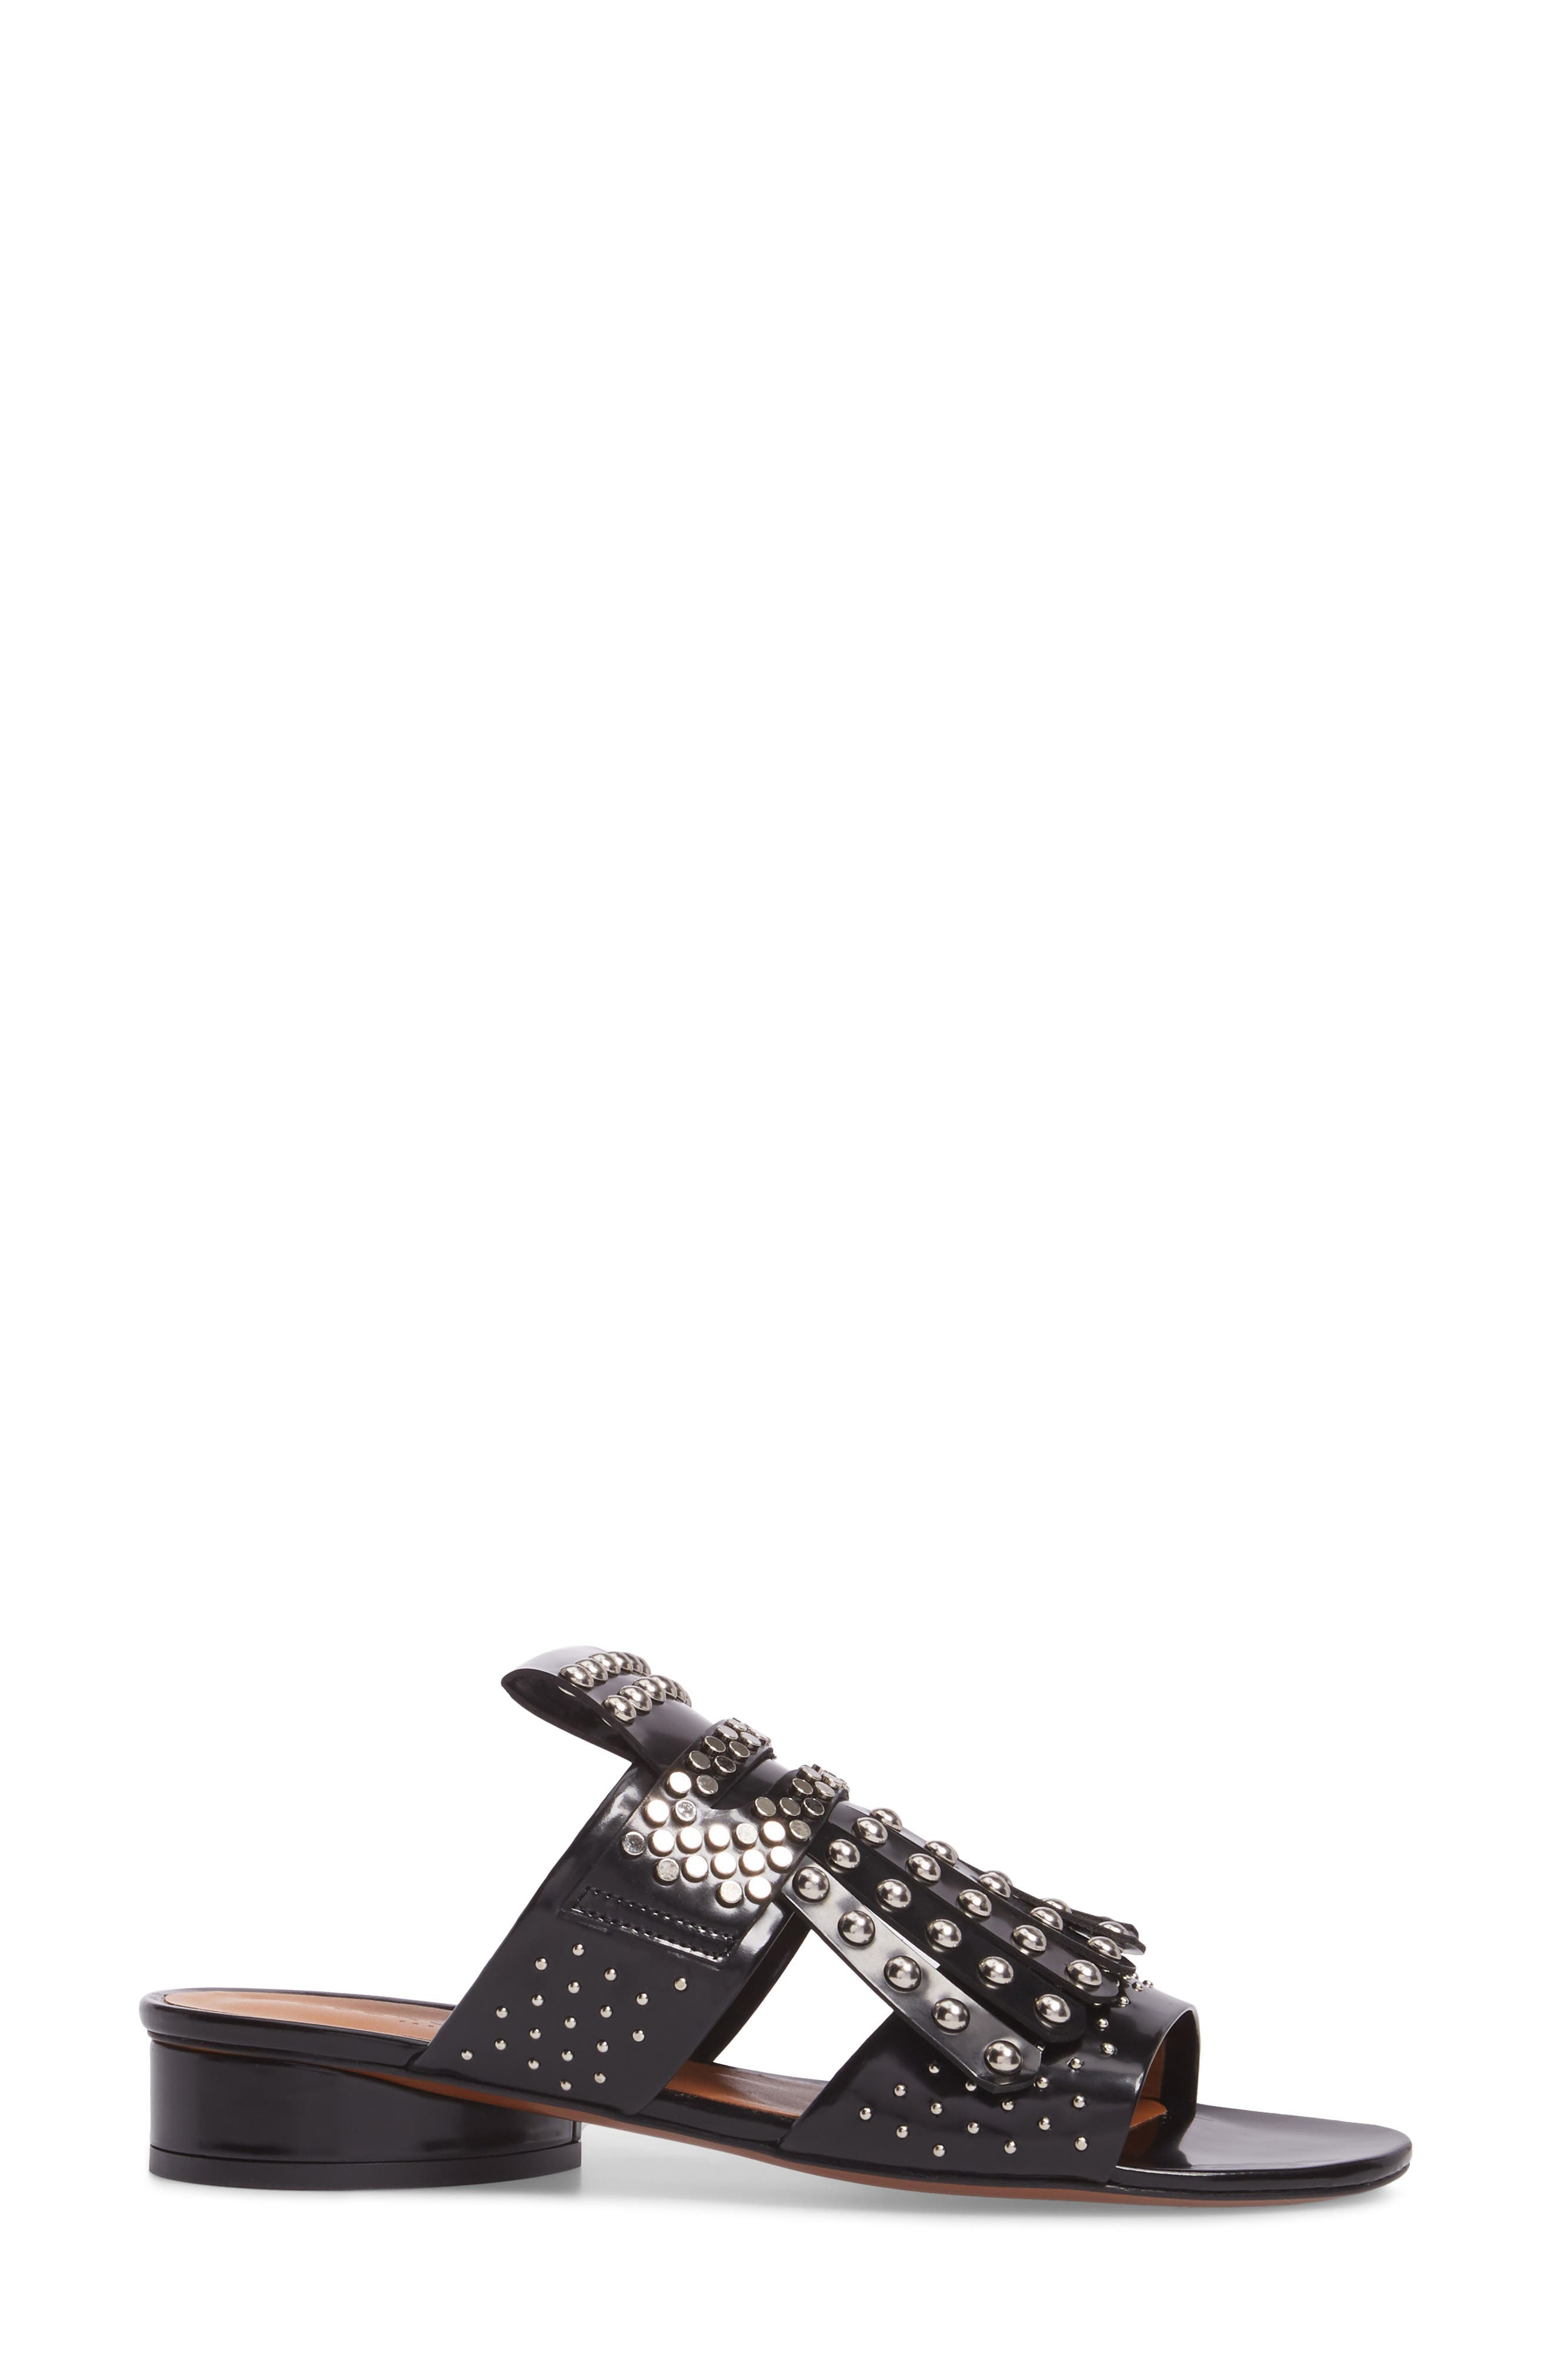 Alternate Image 3  - Robert Clergerie Figlouc Studded Sandal (Women)